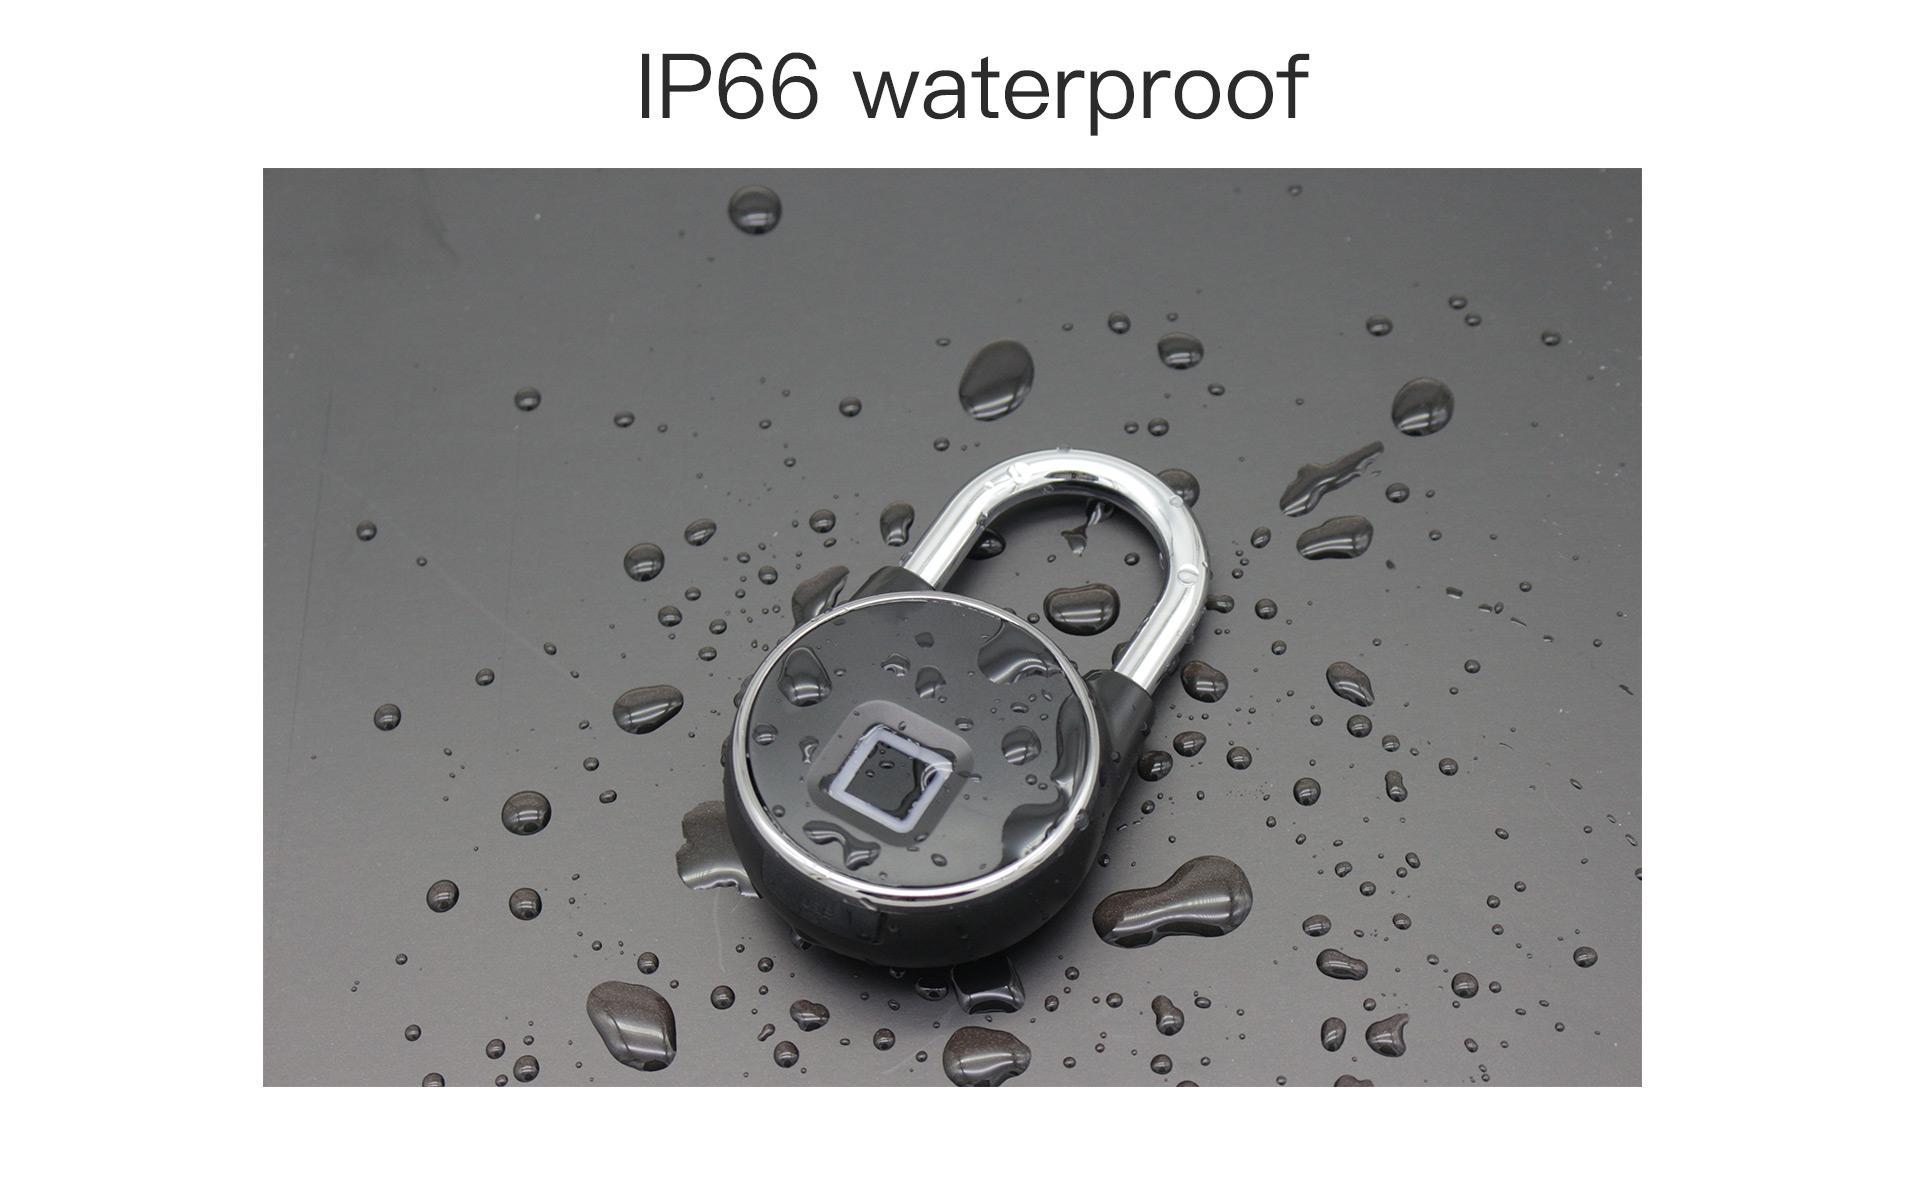 Intelligent IP66 Waterproof Keyless Bluetooth Fingerprint Padlock  7